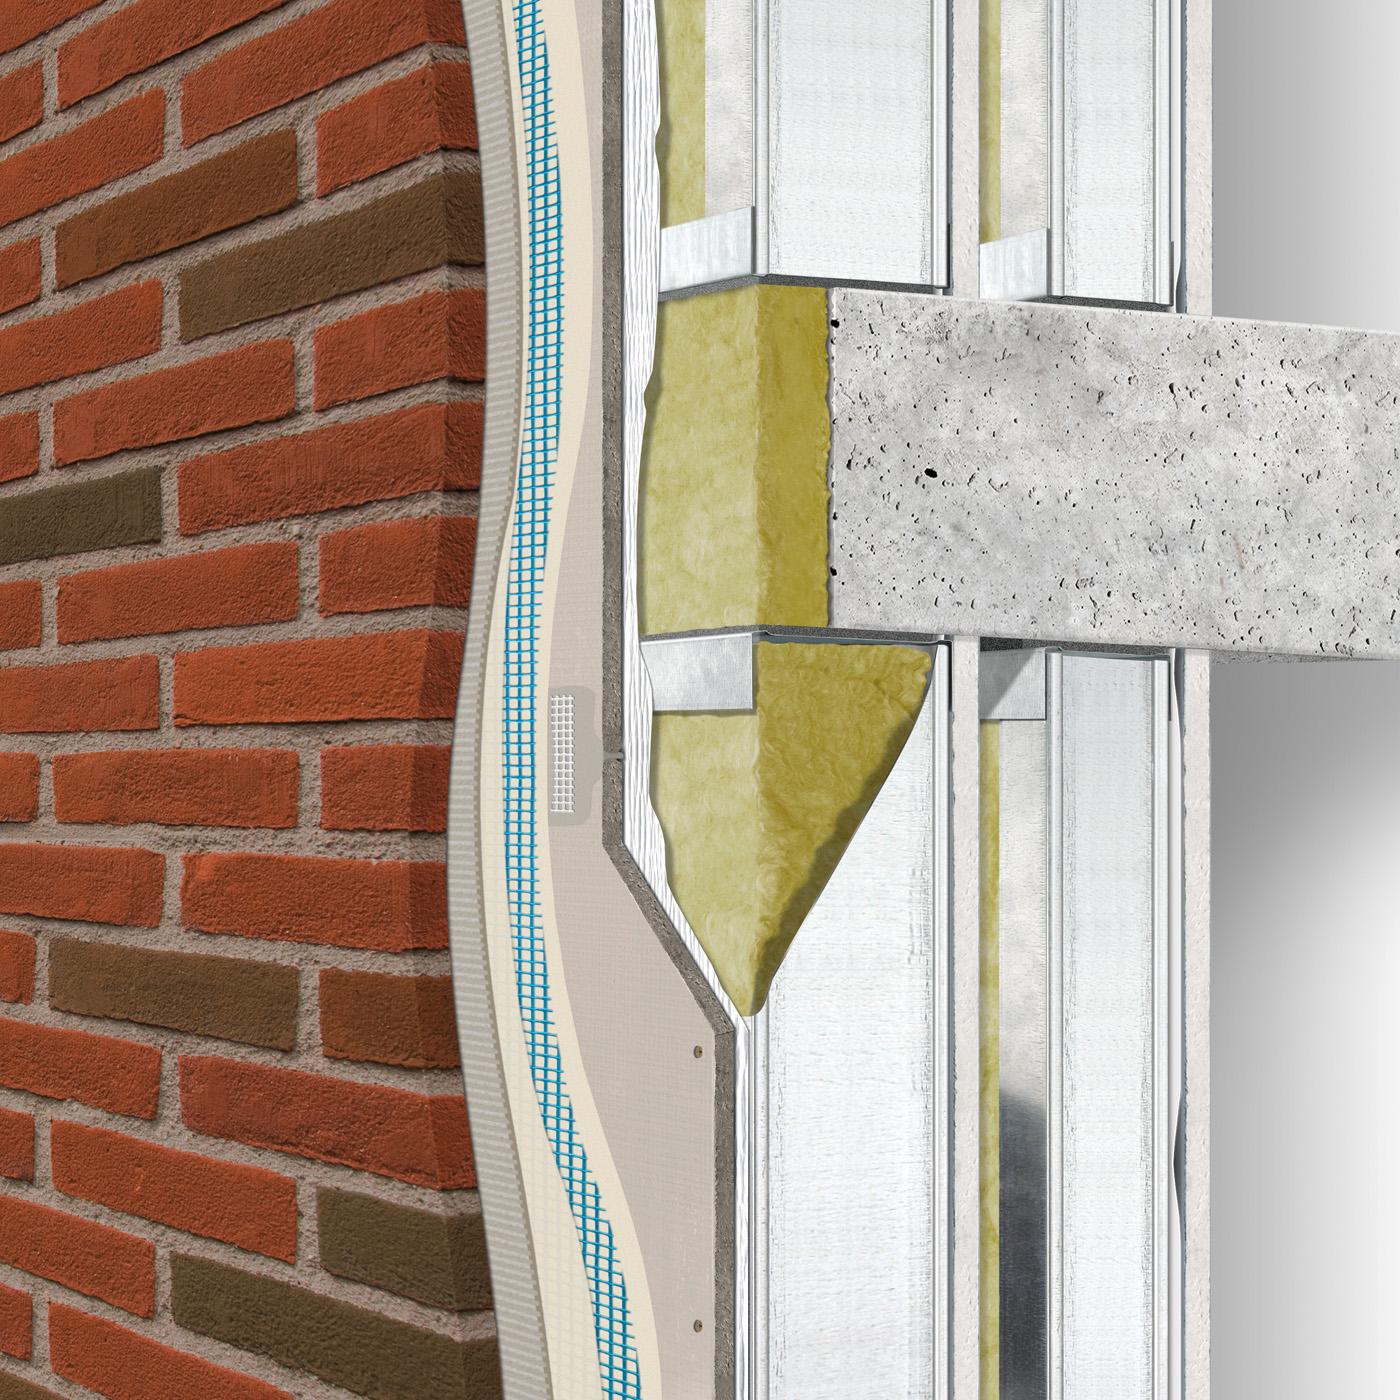 Exterior walls fa ades by knauf aquapanel gmbh co kg - Knauf aquapanel exterior cement board prices ...